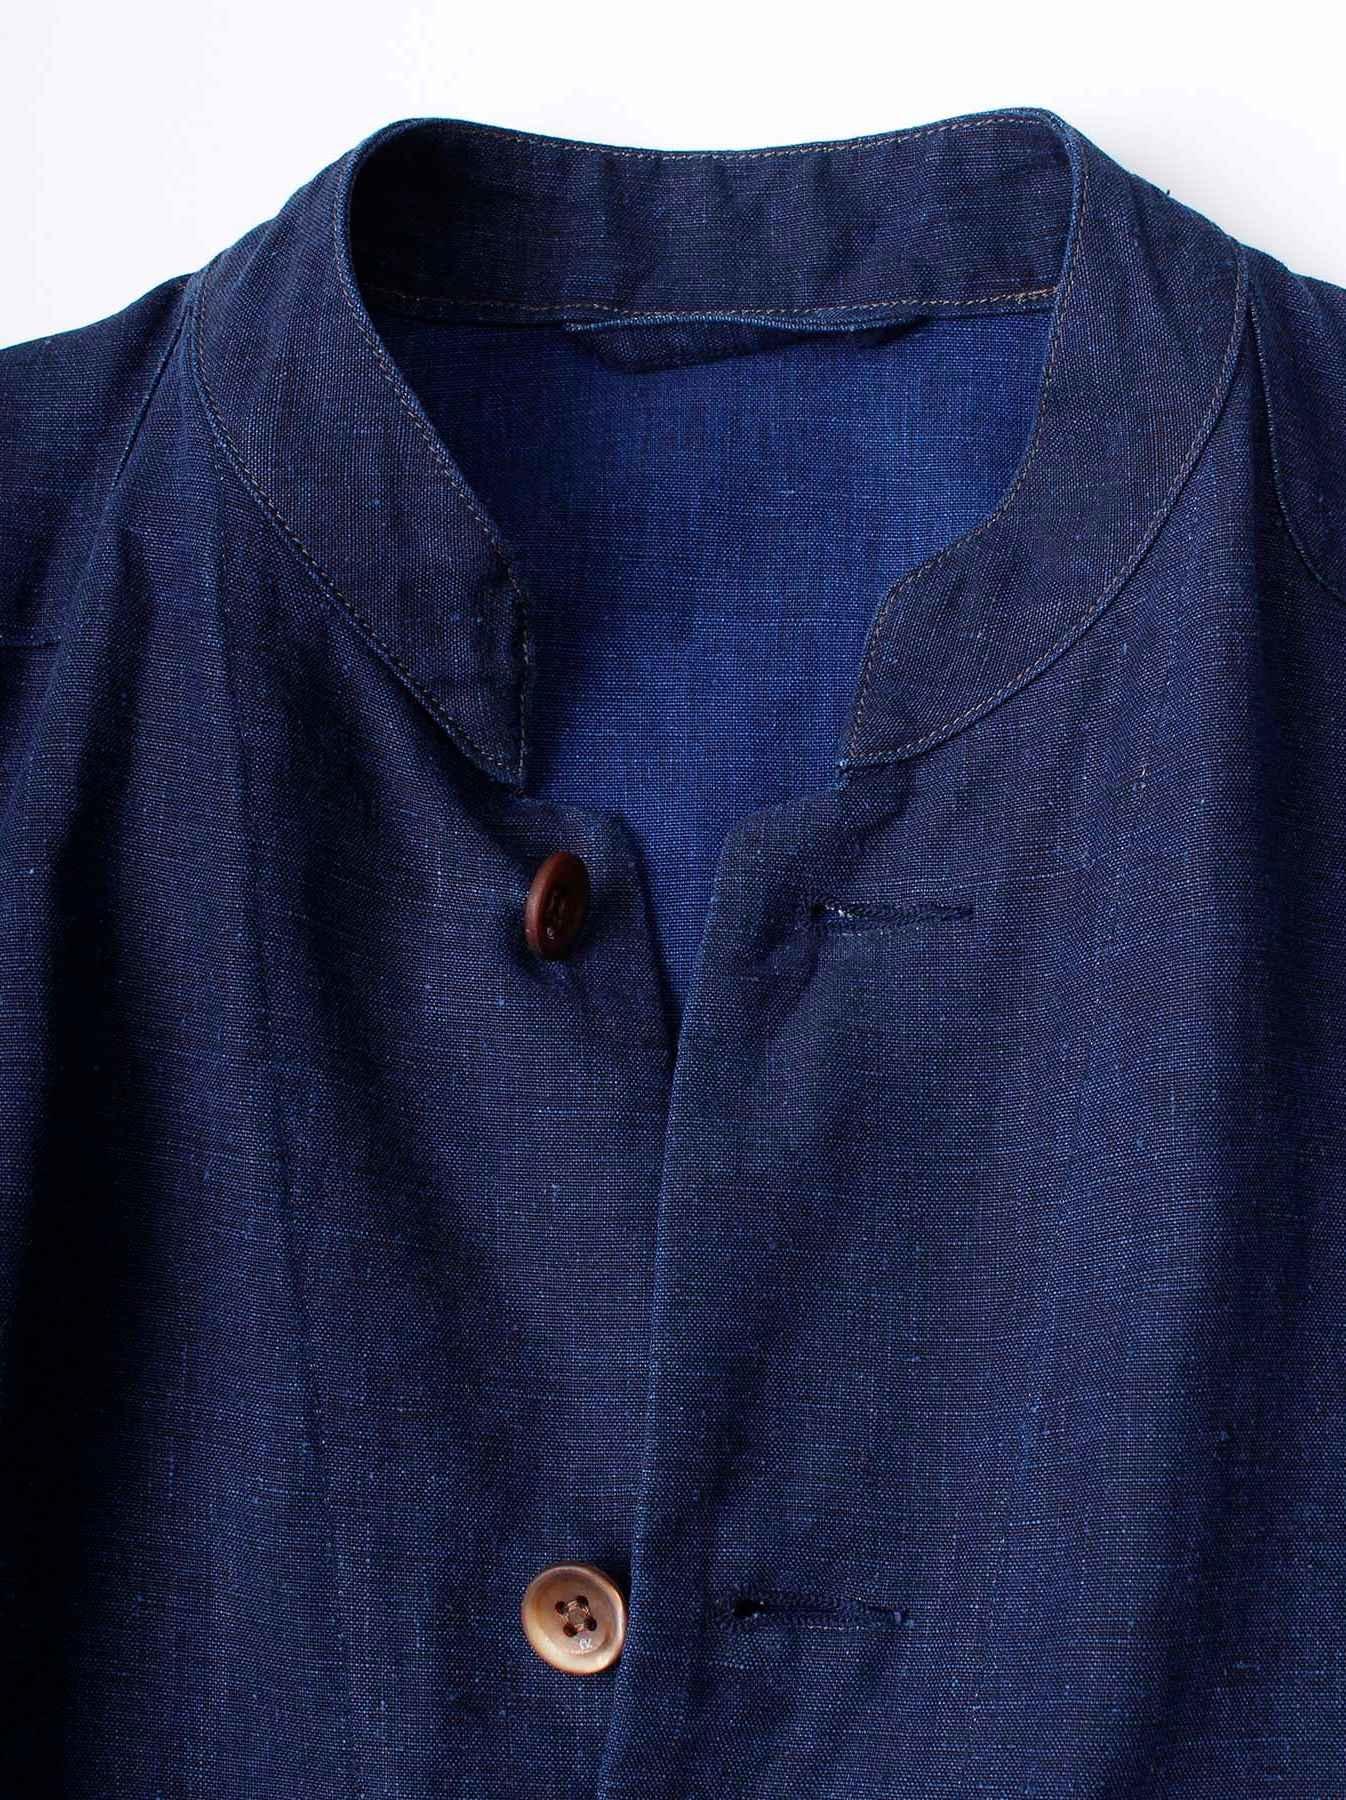 WH Indigo Linen Stand Collar Jacket-6